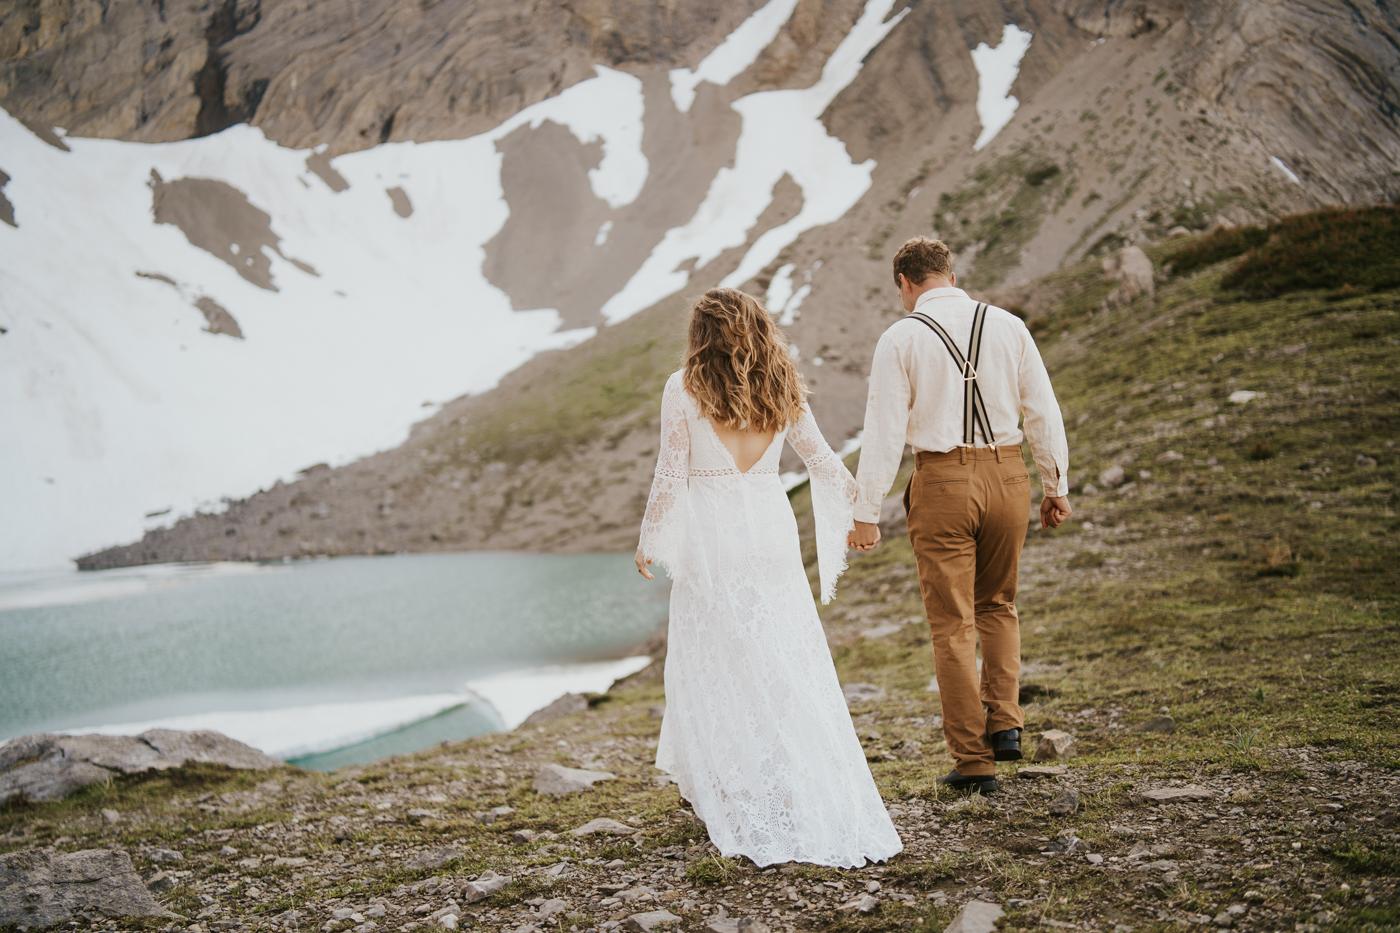 tyraephotography_photographer_wedding_elopement_engagement_photography-07549.jpg